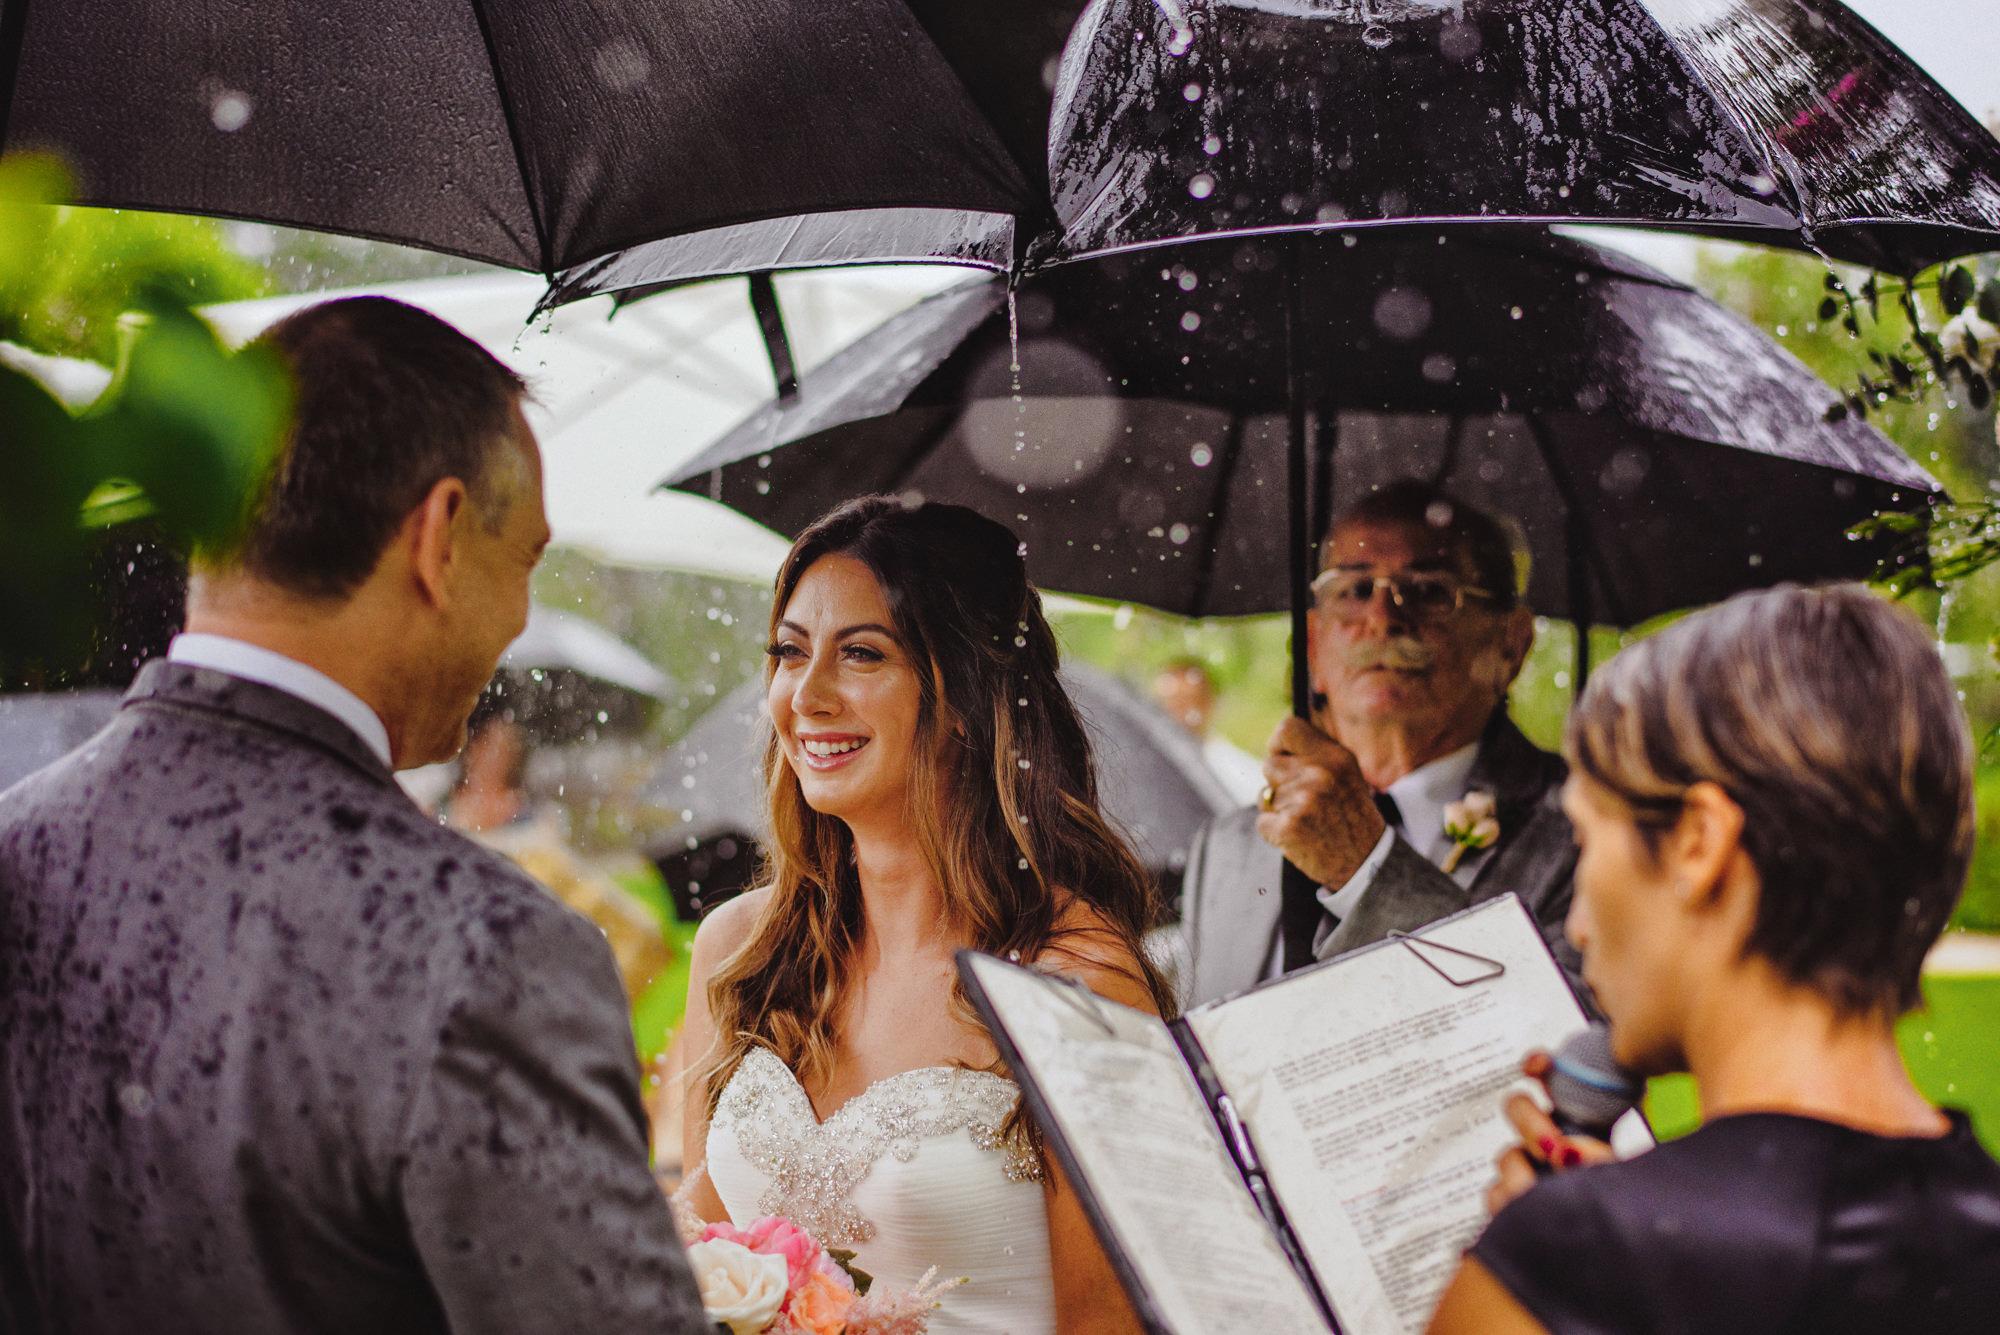 wedding-ceremony-in-the-rain-with-umbrellas-worlds-best-wedding-photos-fer-juaristi-mexico-wedding-photographers